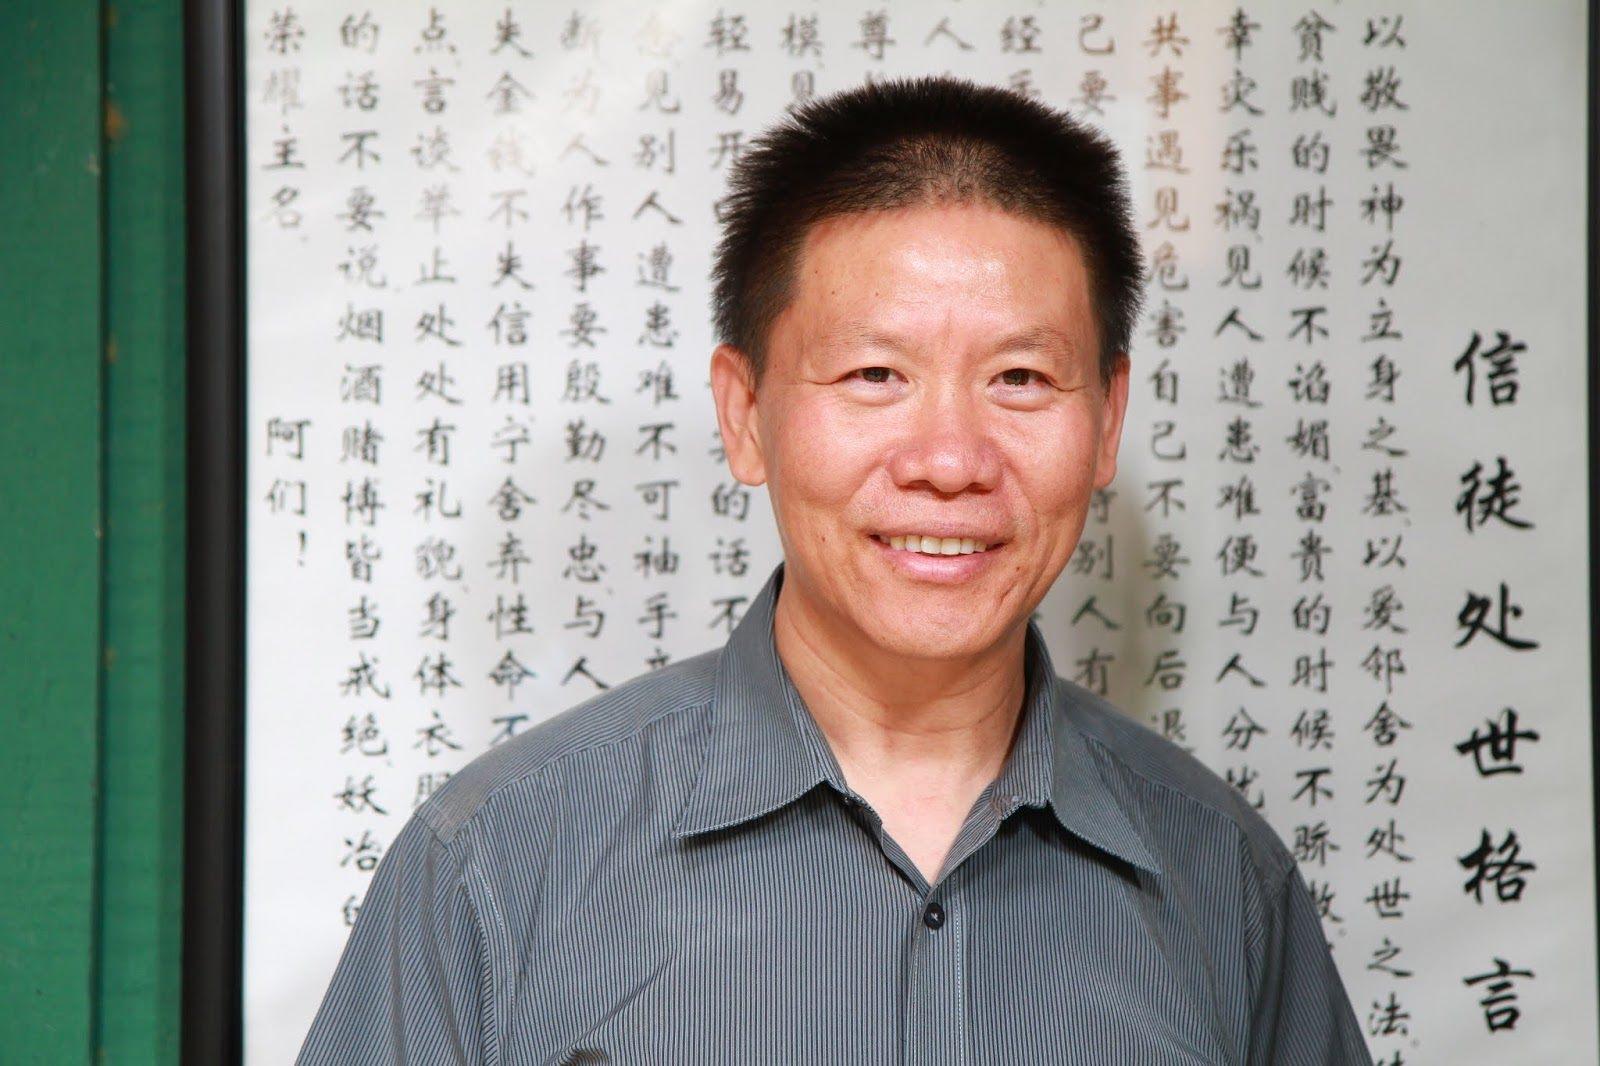 China Aid's Bob Fu receives death threats